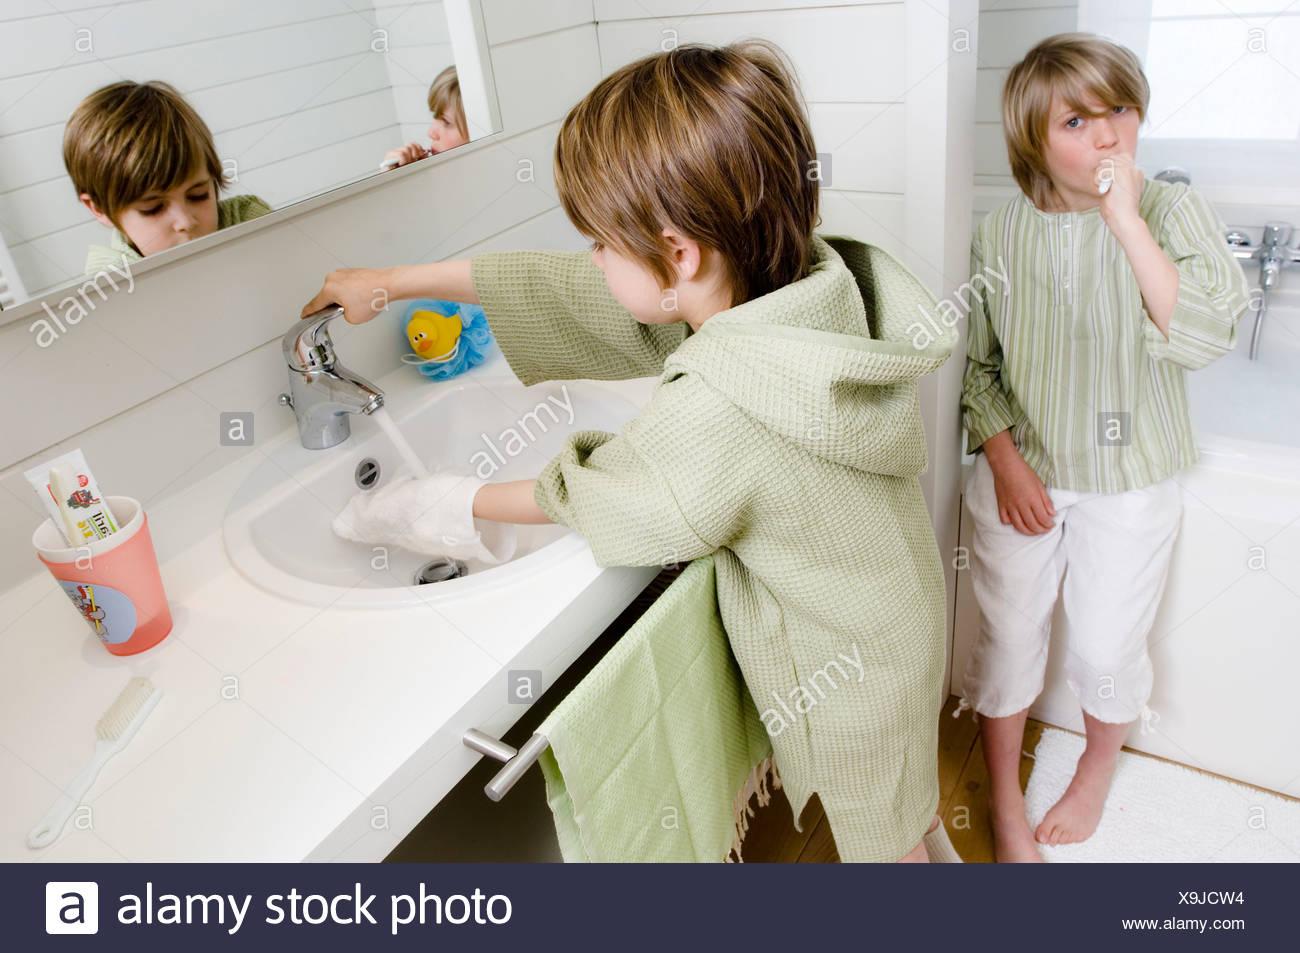 2 Kinder im Badezimmer Stockfoto, Bild: 281303040 - Alamy